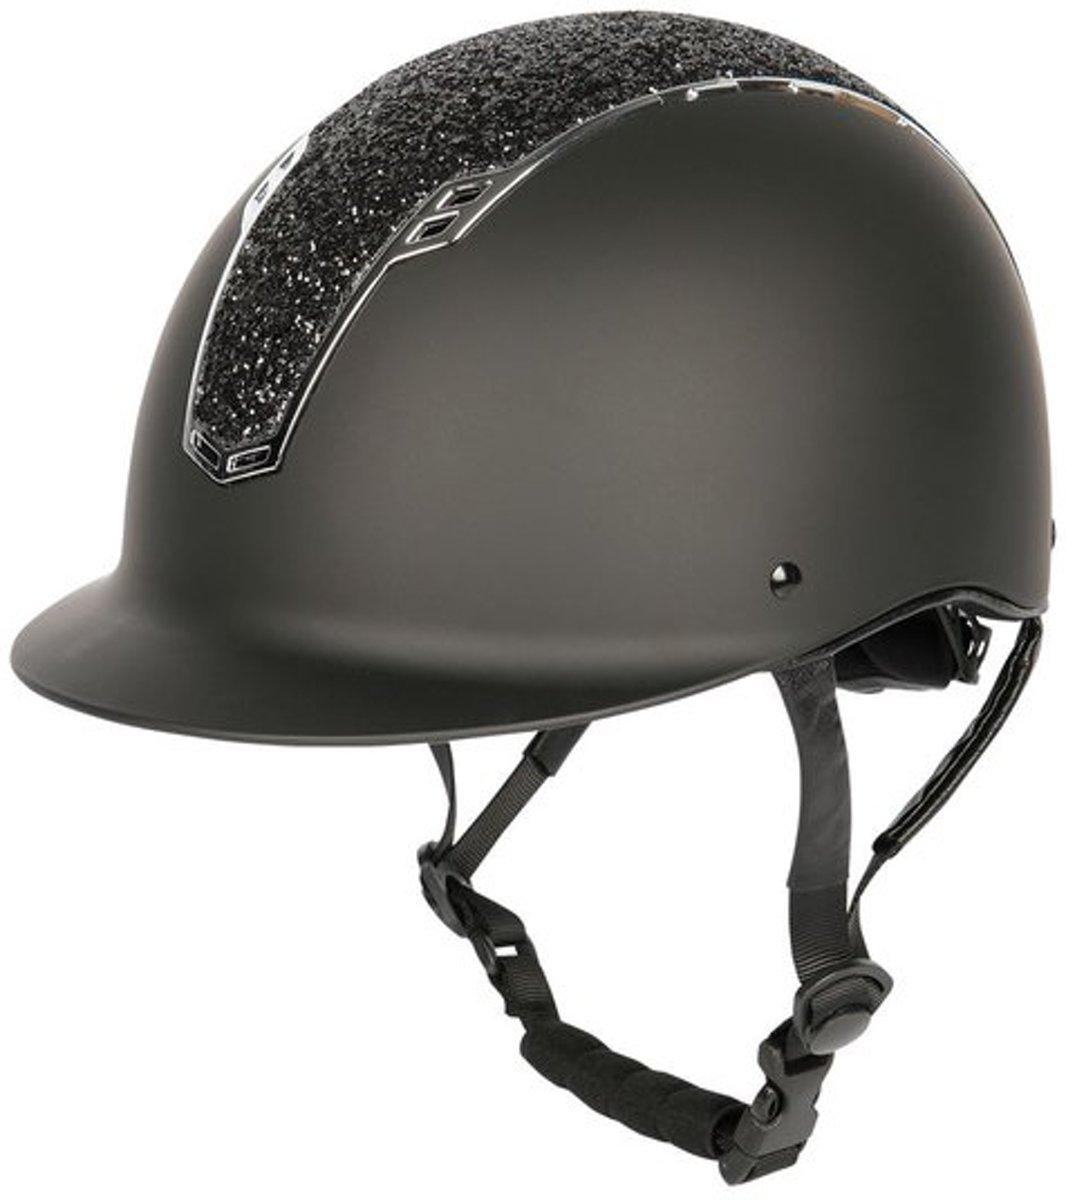 Harry's Horse Veiligheidscap, Centaur NXT M-L zwart-zilver